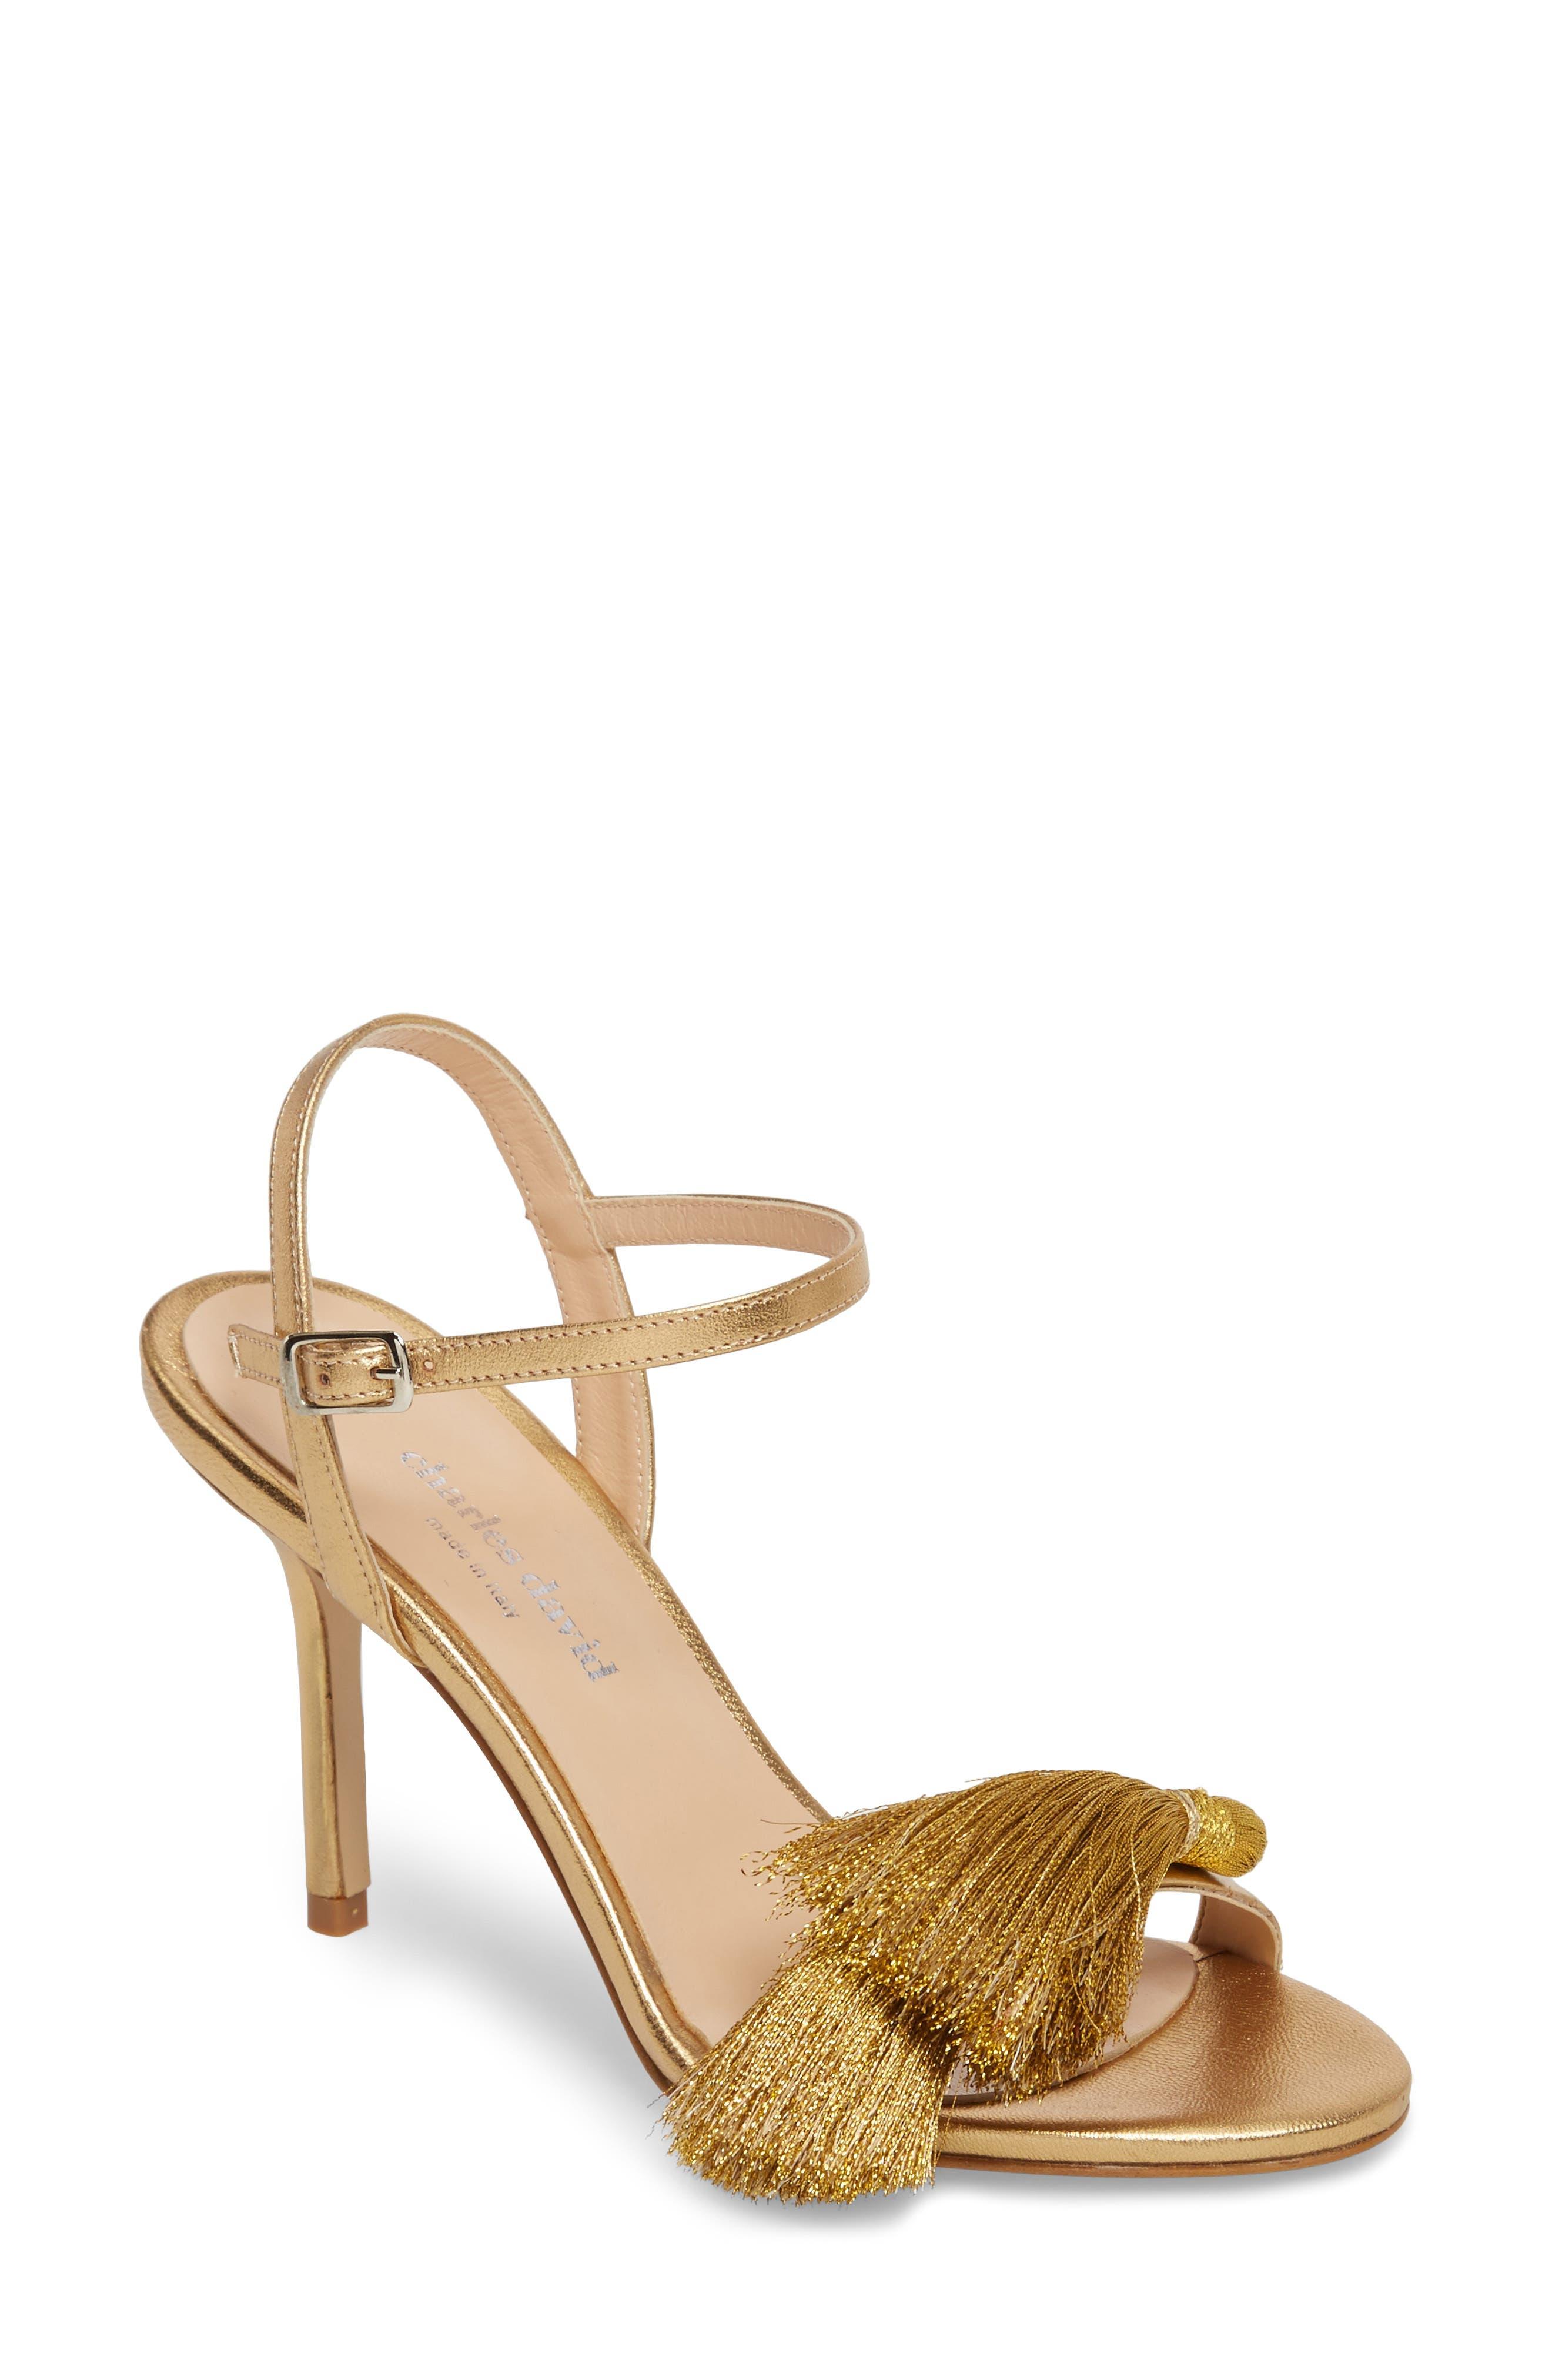 Sassy Tassel Sandal,                         Main,                         color, Gold Leather